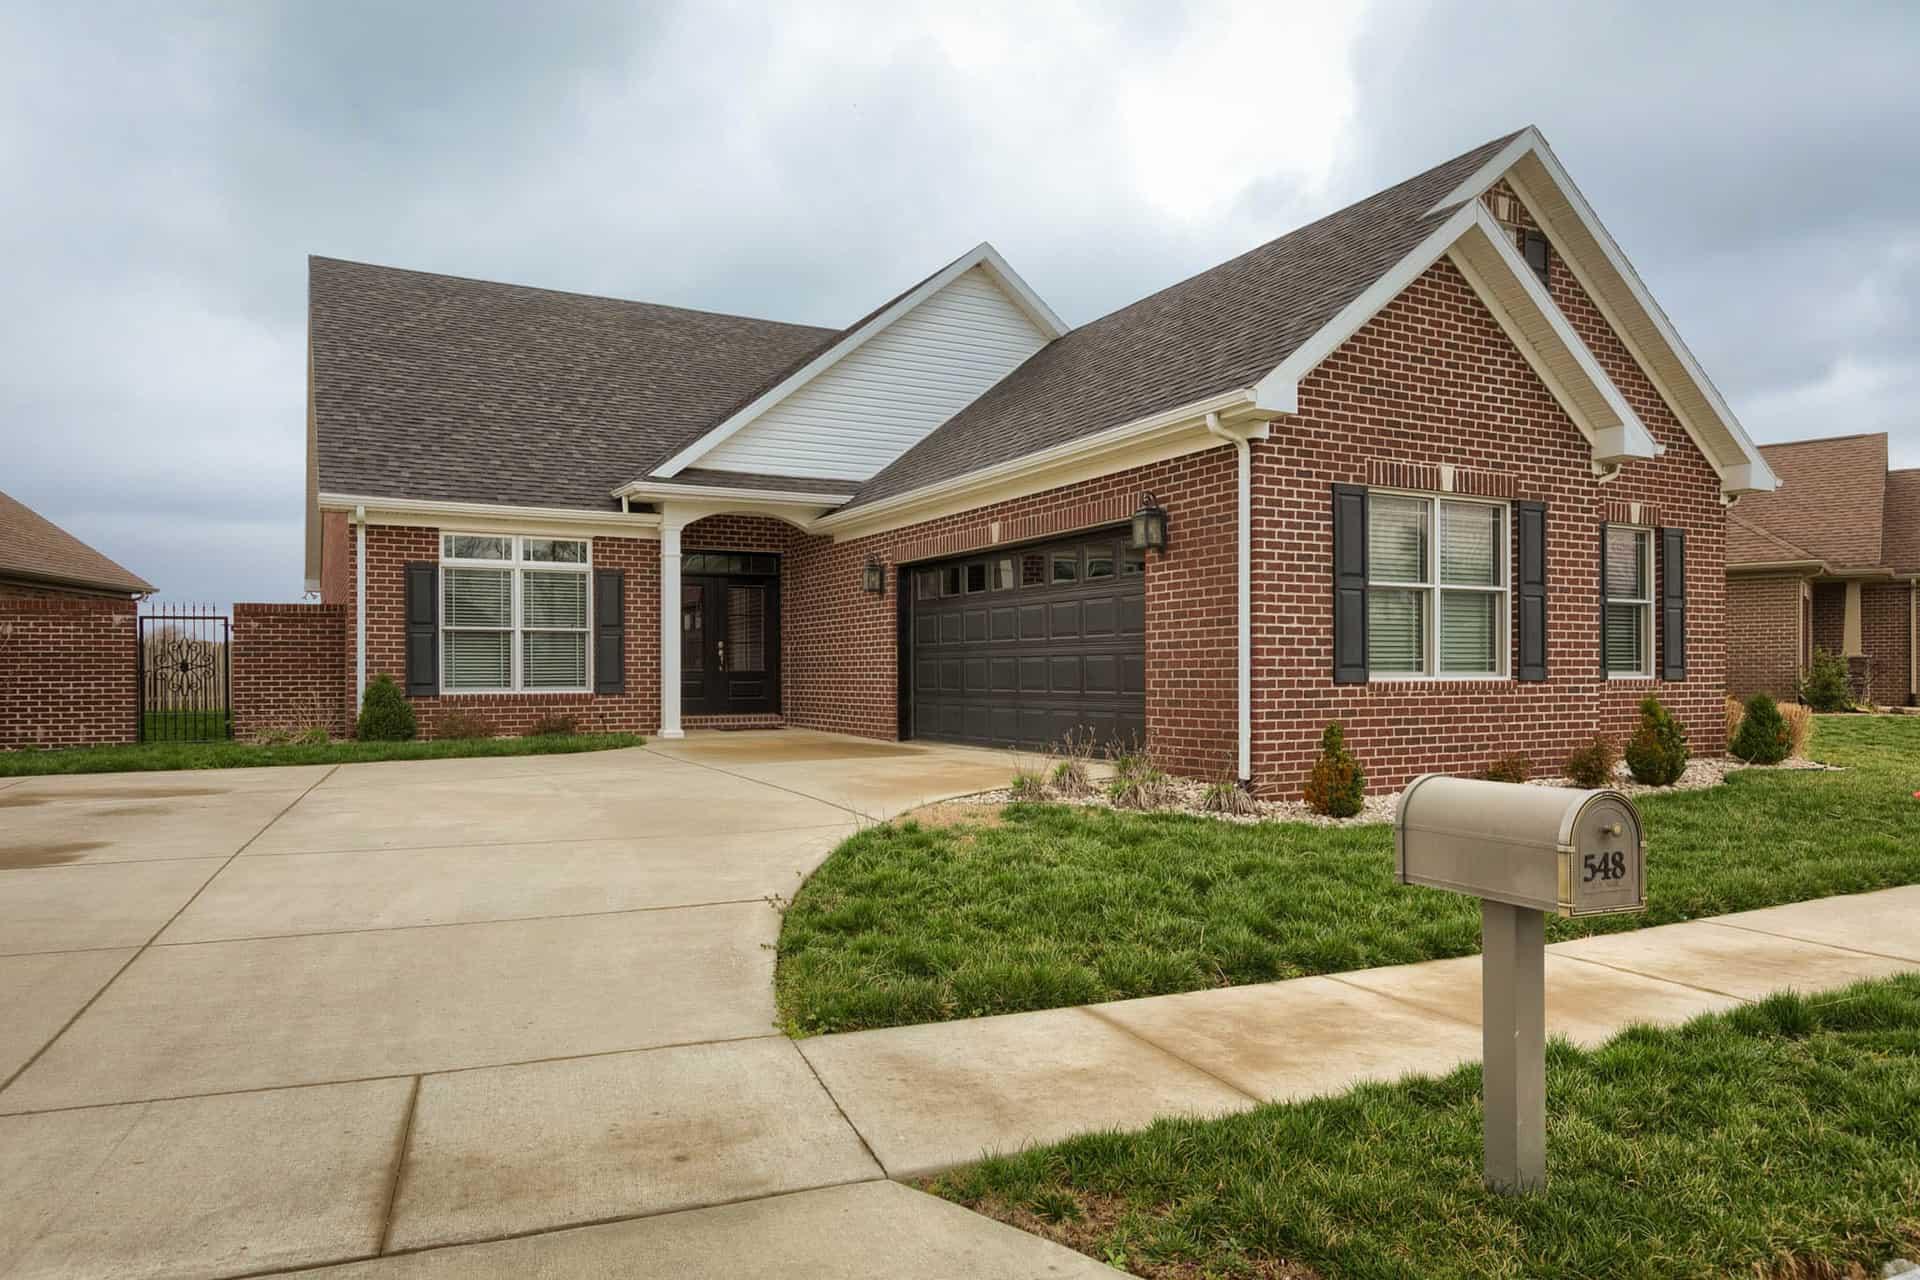 548 Stableford Circle, Owensboro, KY 42303